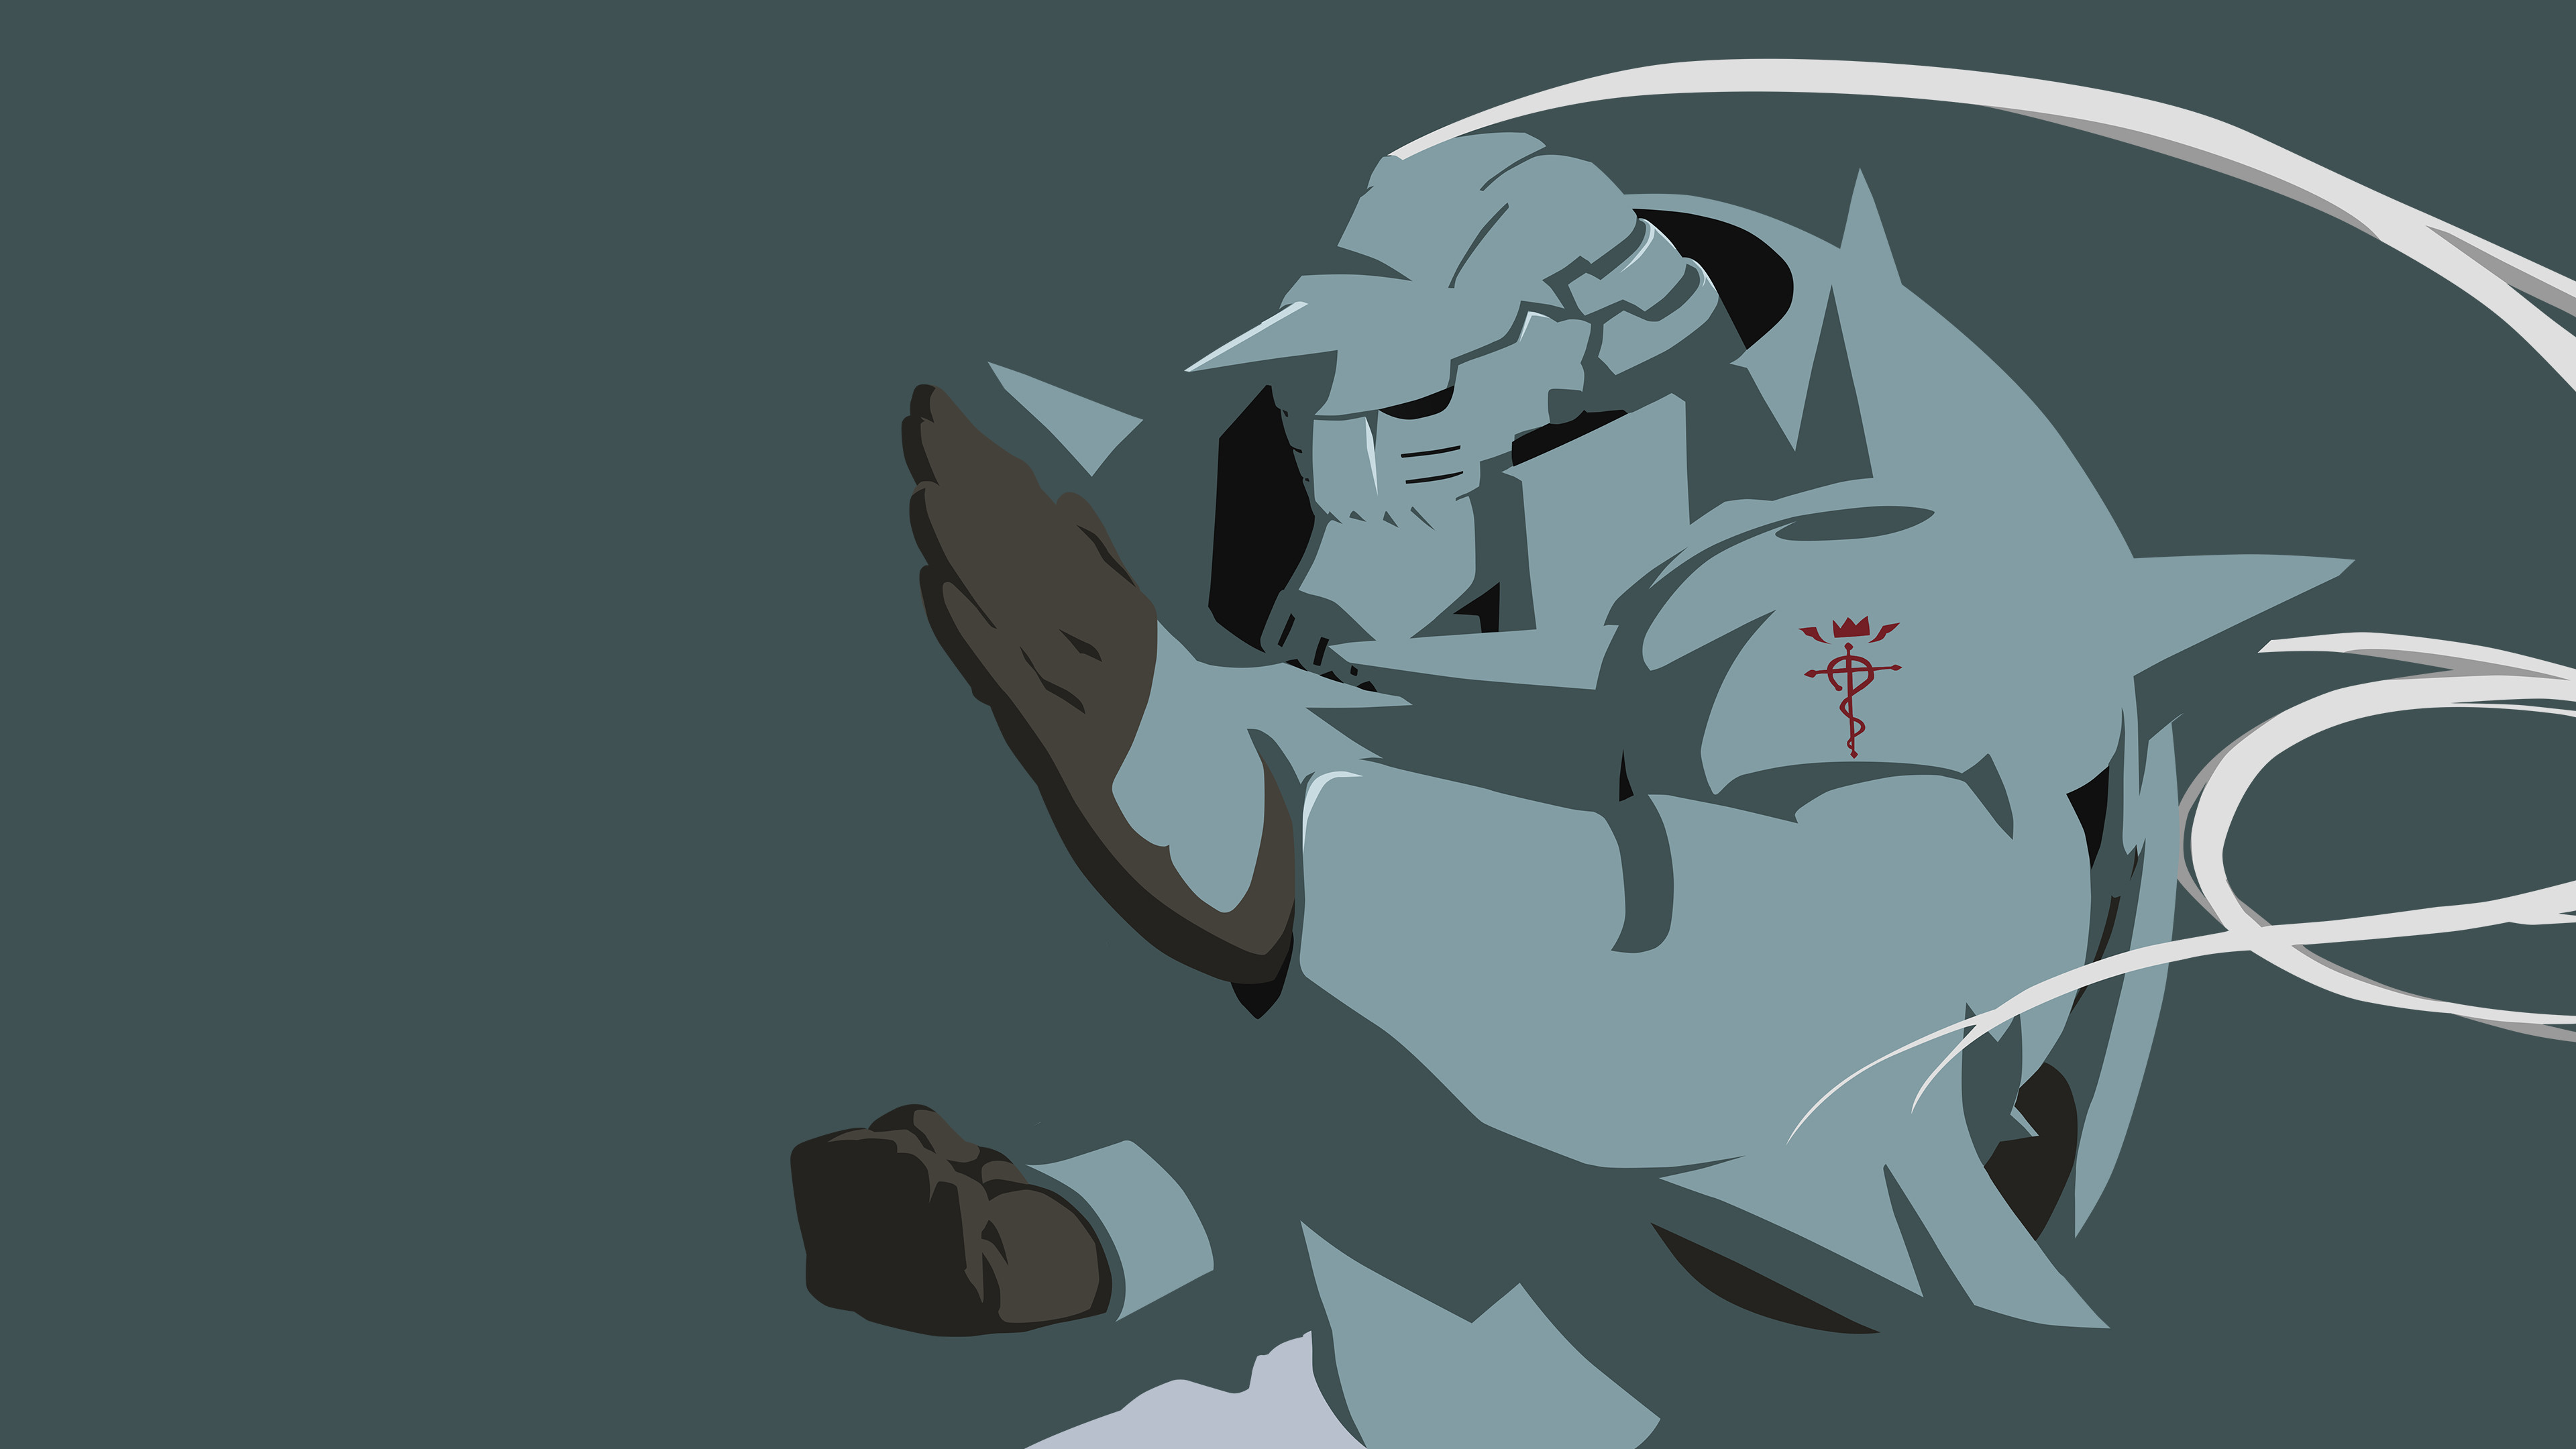 Fullmetal-Alchemist-Alphonse-HD-Desktop-Backgrounds